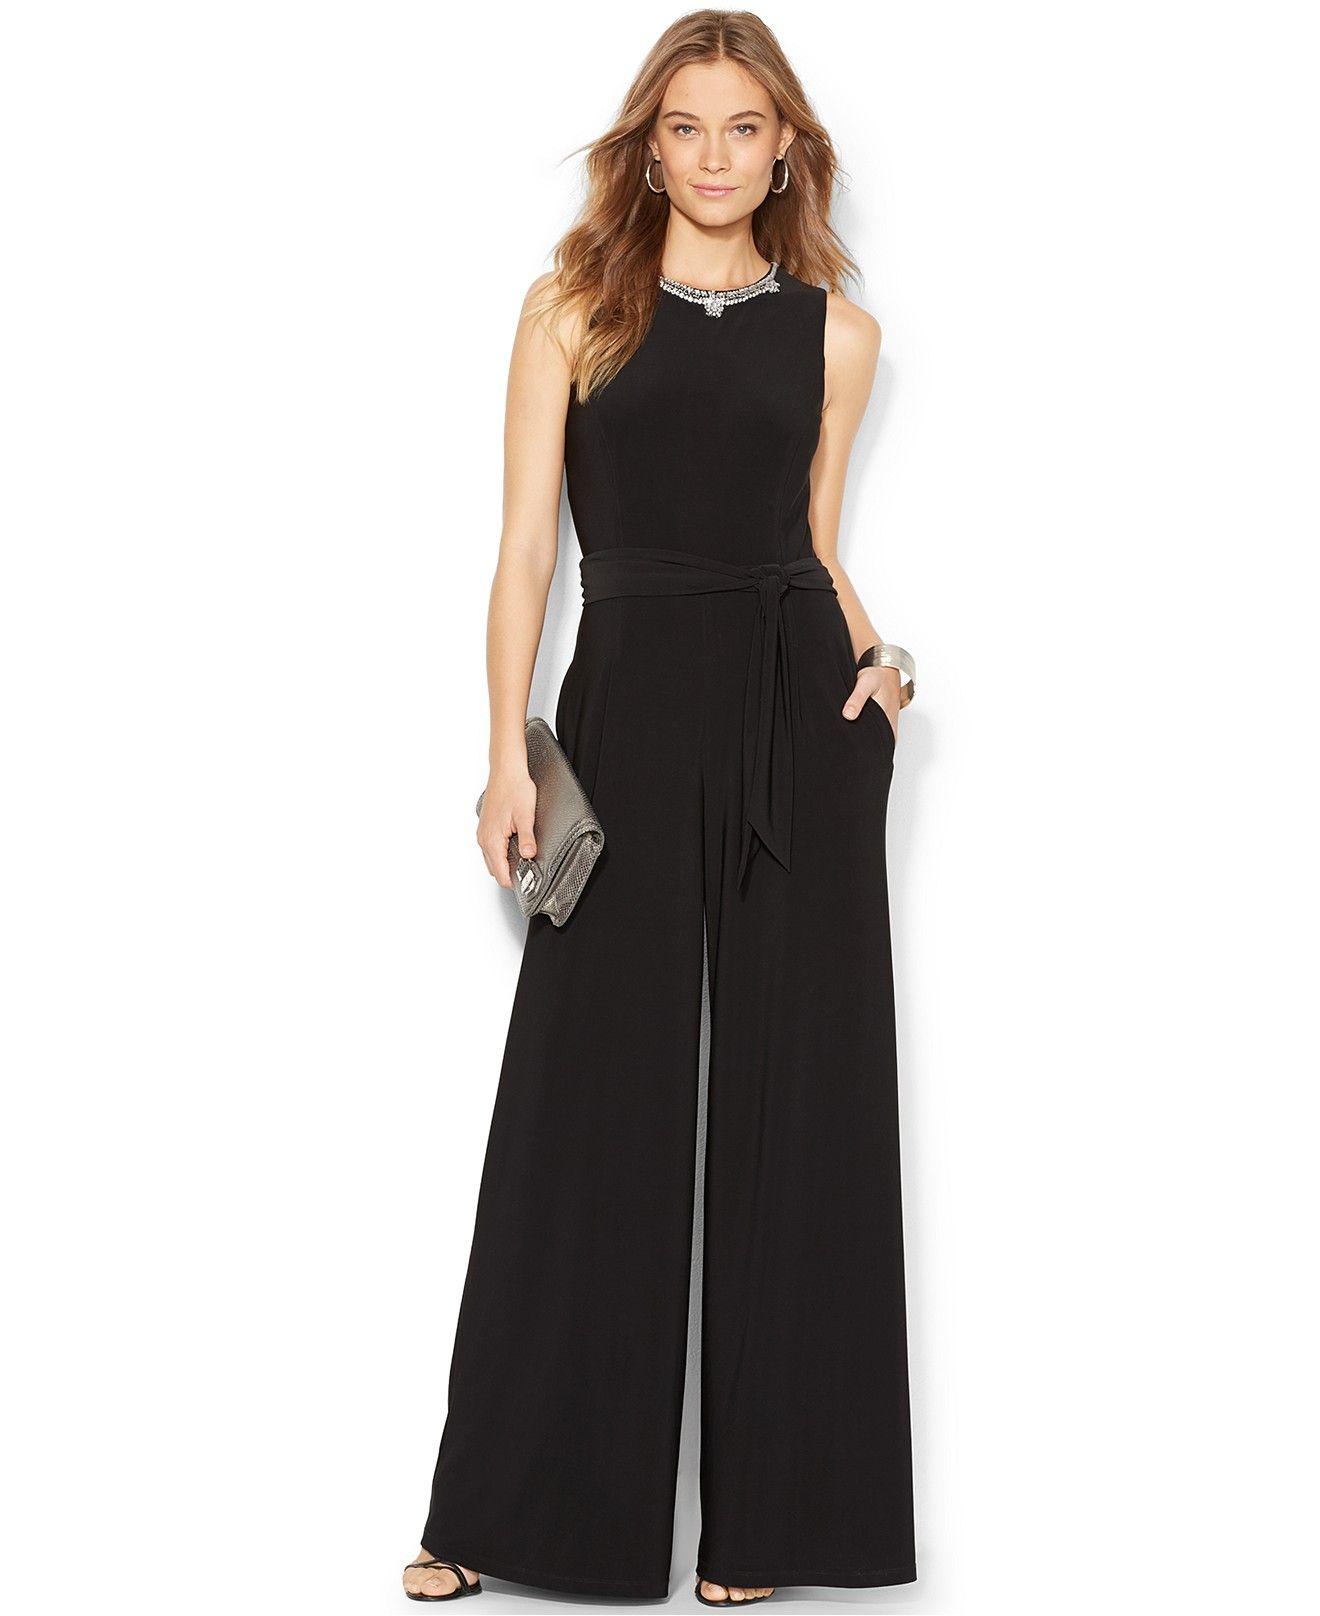 edc49bd2051f Lauren Ralph Lauren Embellished Wide-Leg Jumpsuit - Jumpsuits   Rompers -  Women - Macy s